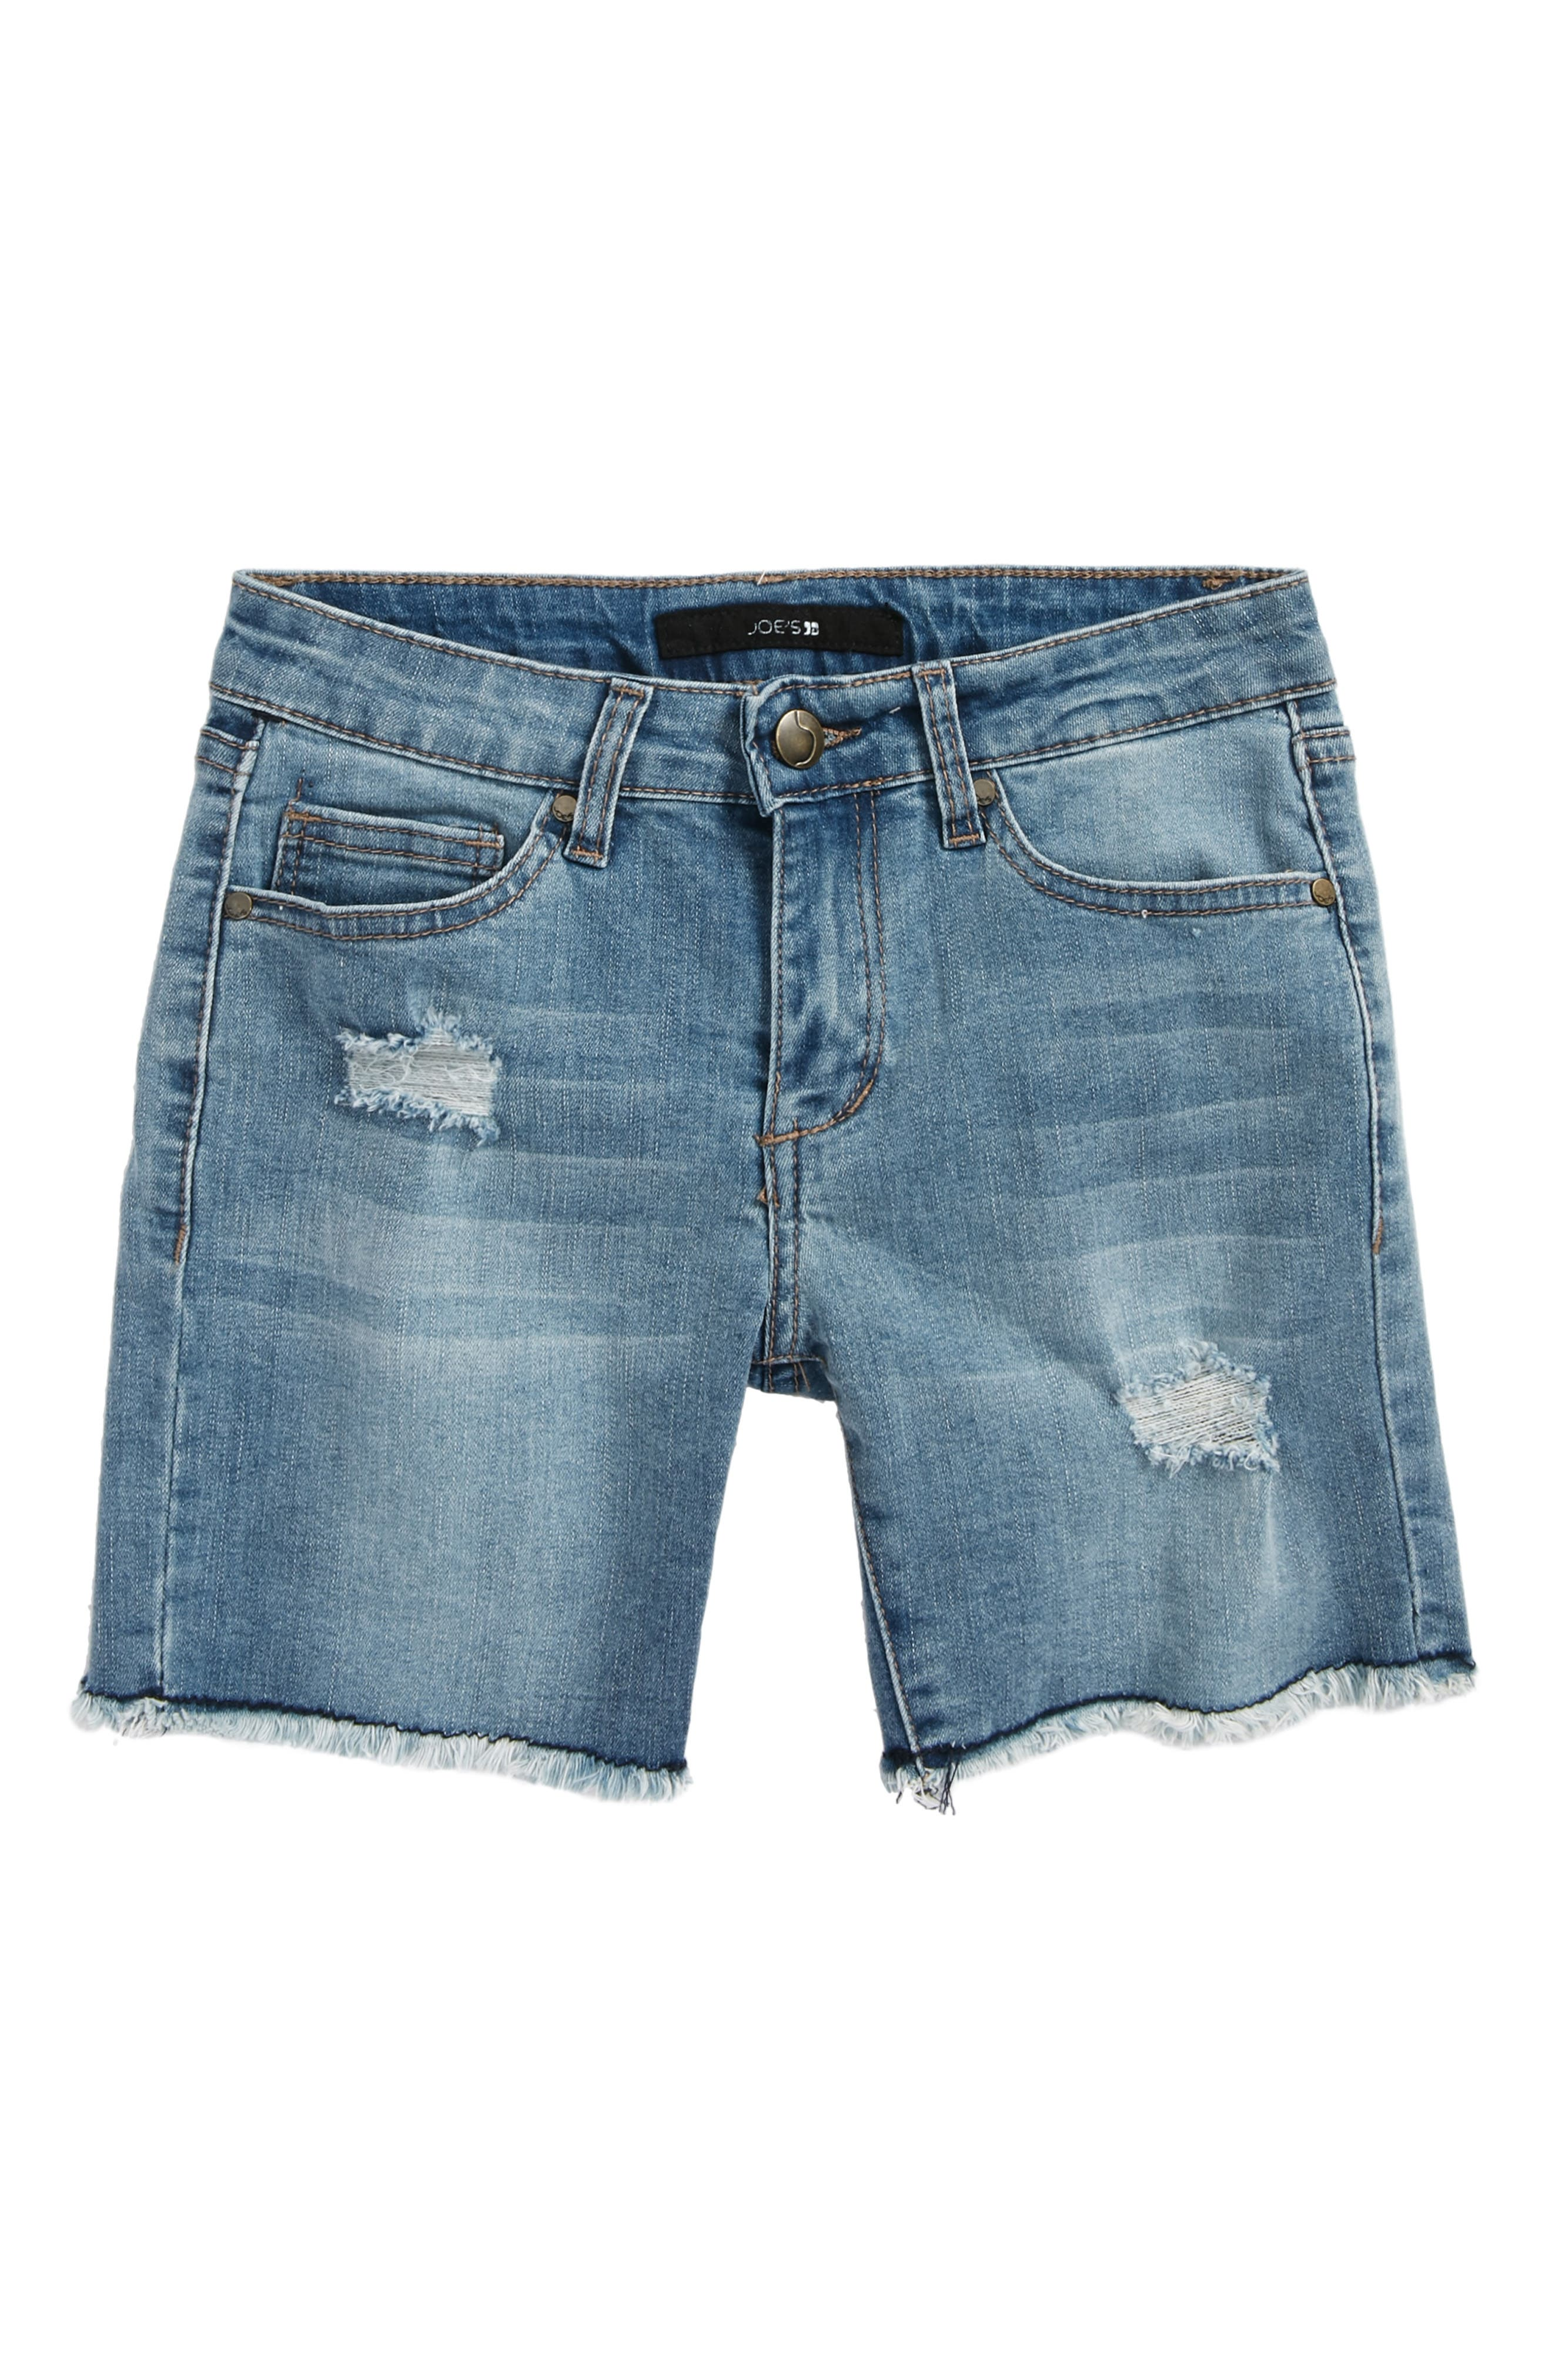 Frayed Mid Rise Bermuda Denim Shorts,                         Main,                         color, MDW-MEDIUM WASH